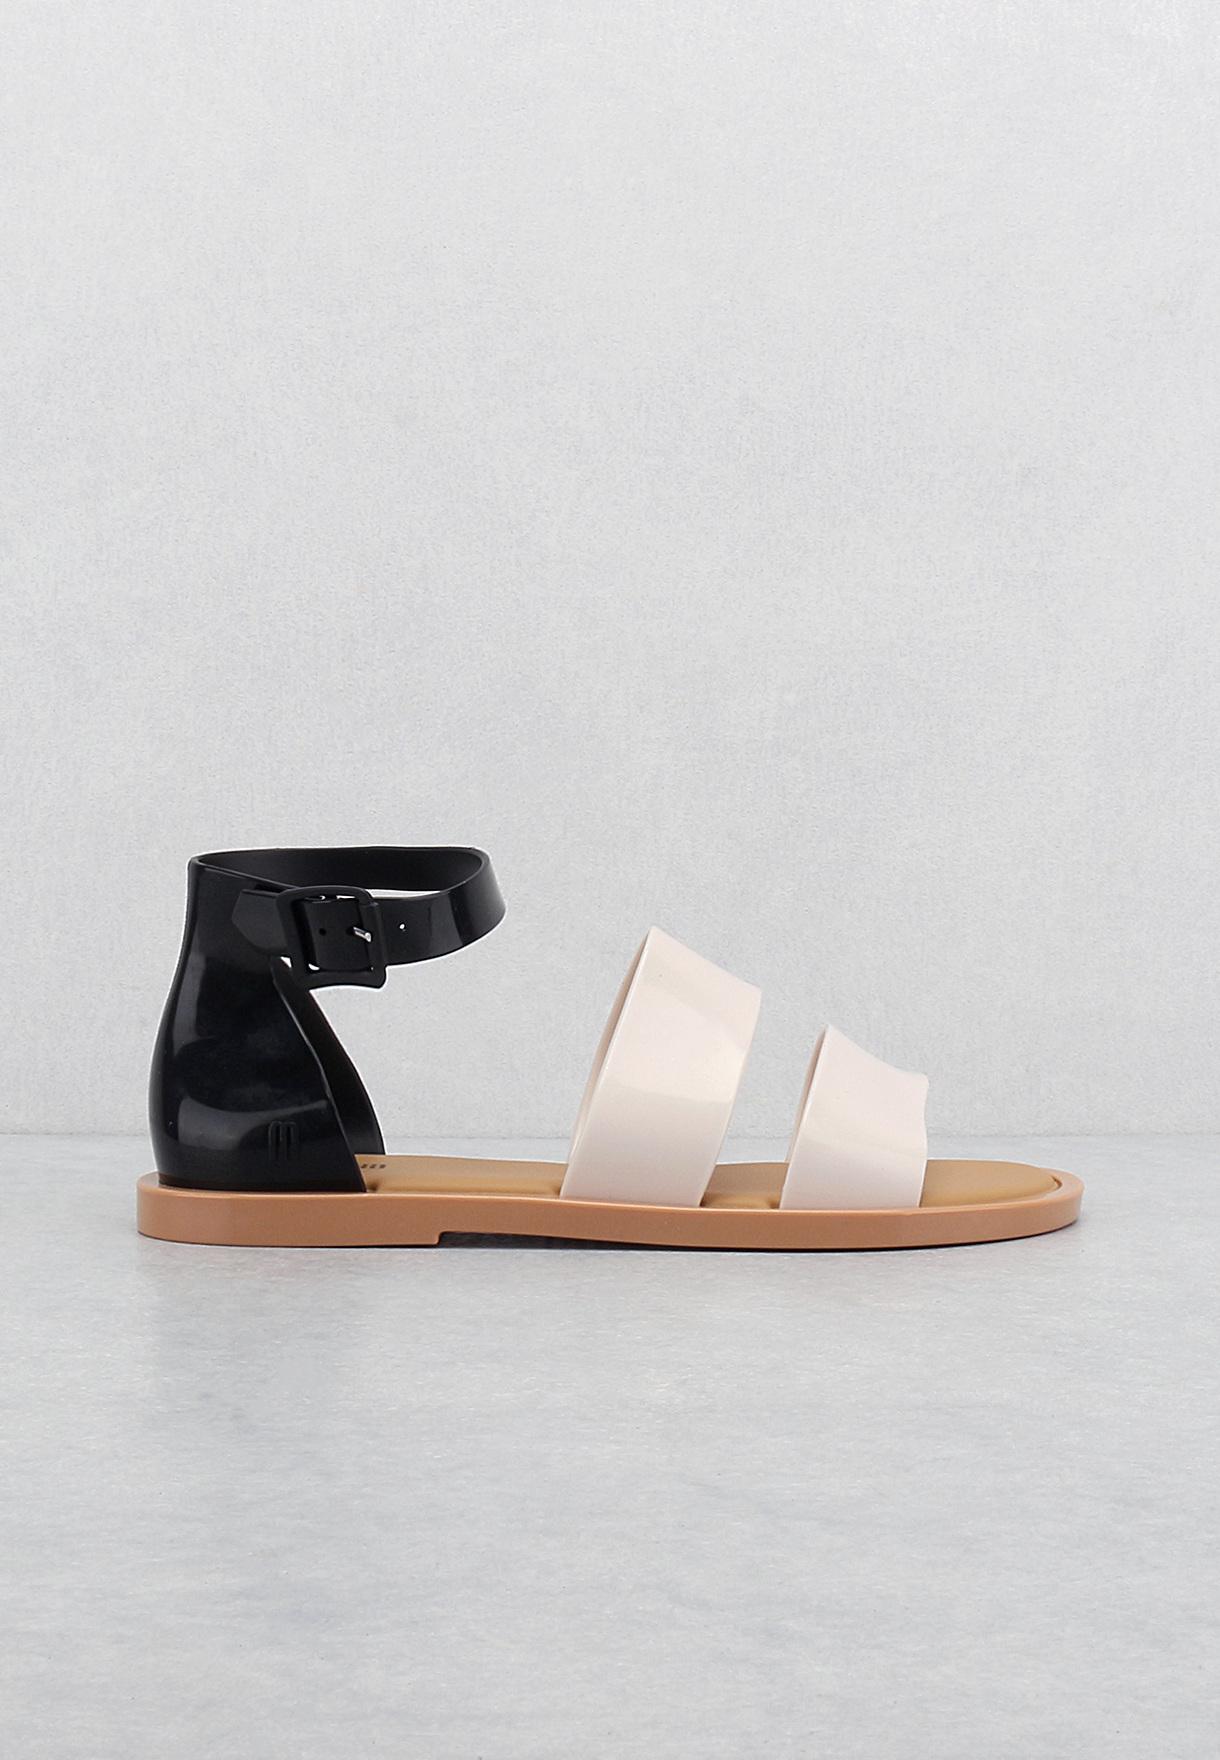 Model Sandals